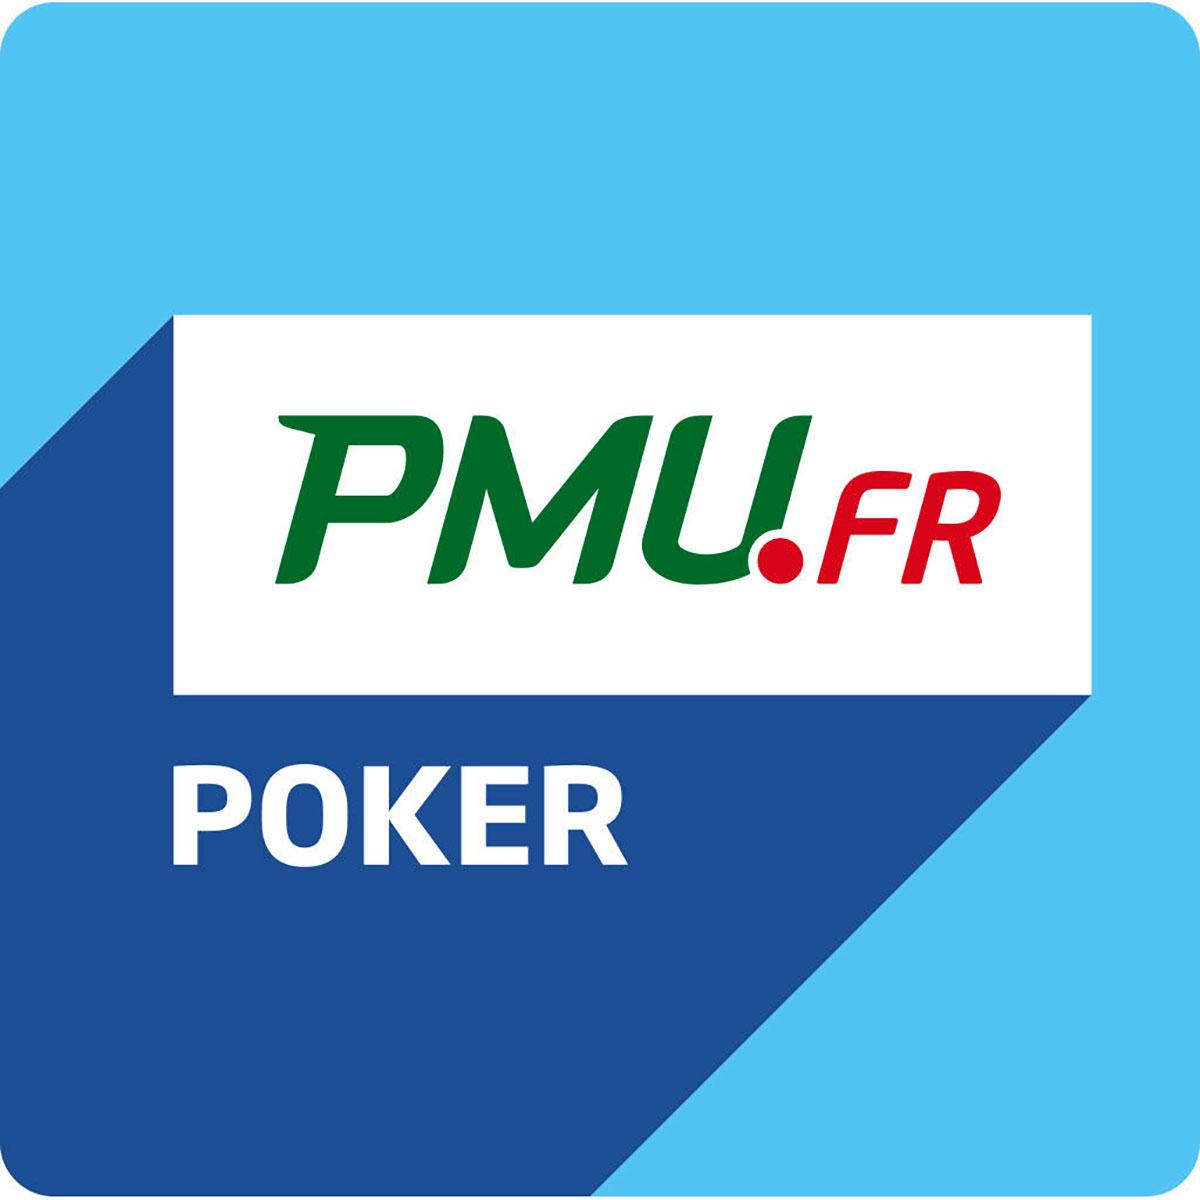 Freeroll pmu poker parking for new york new york casino las vegas